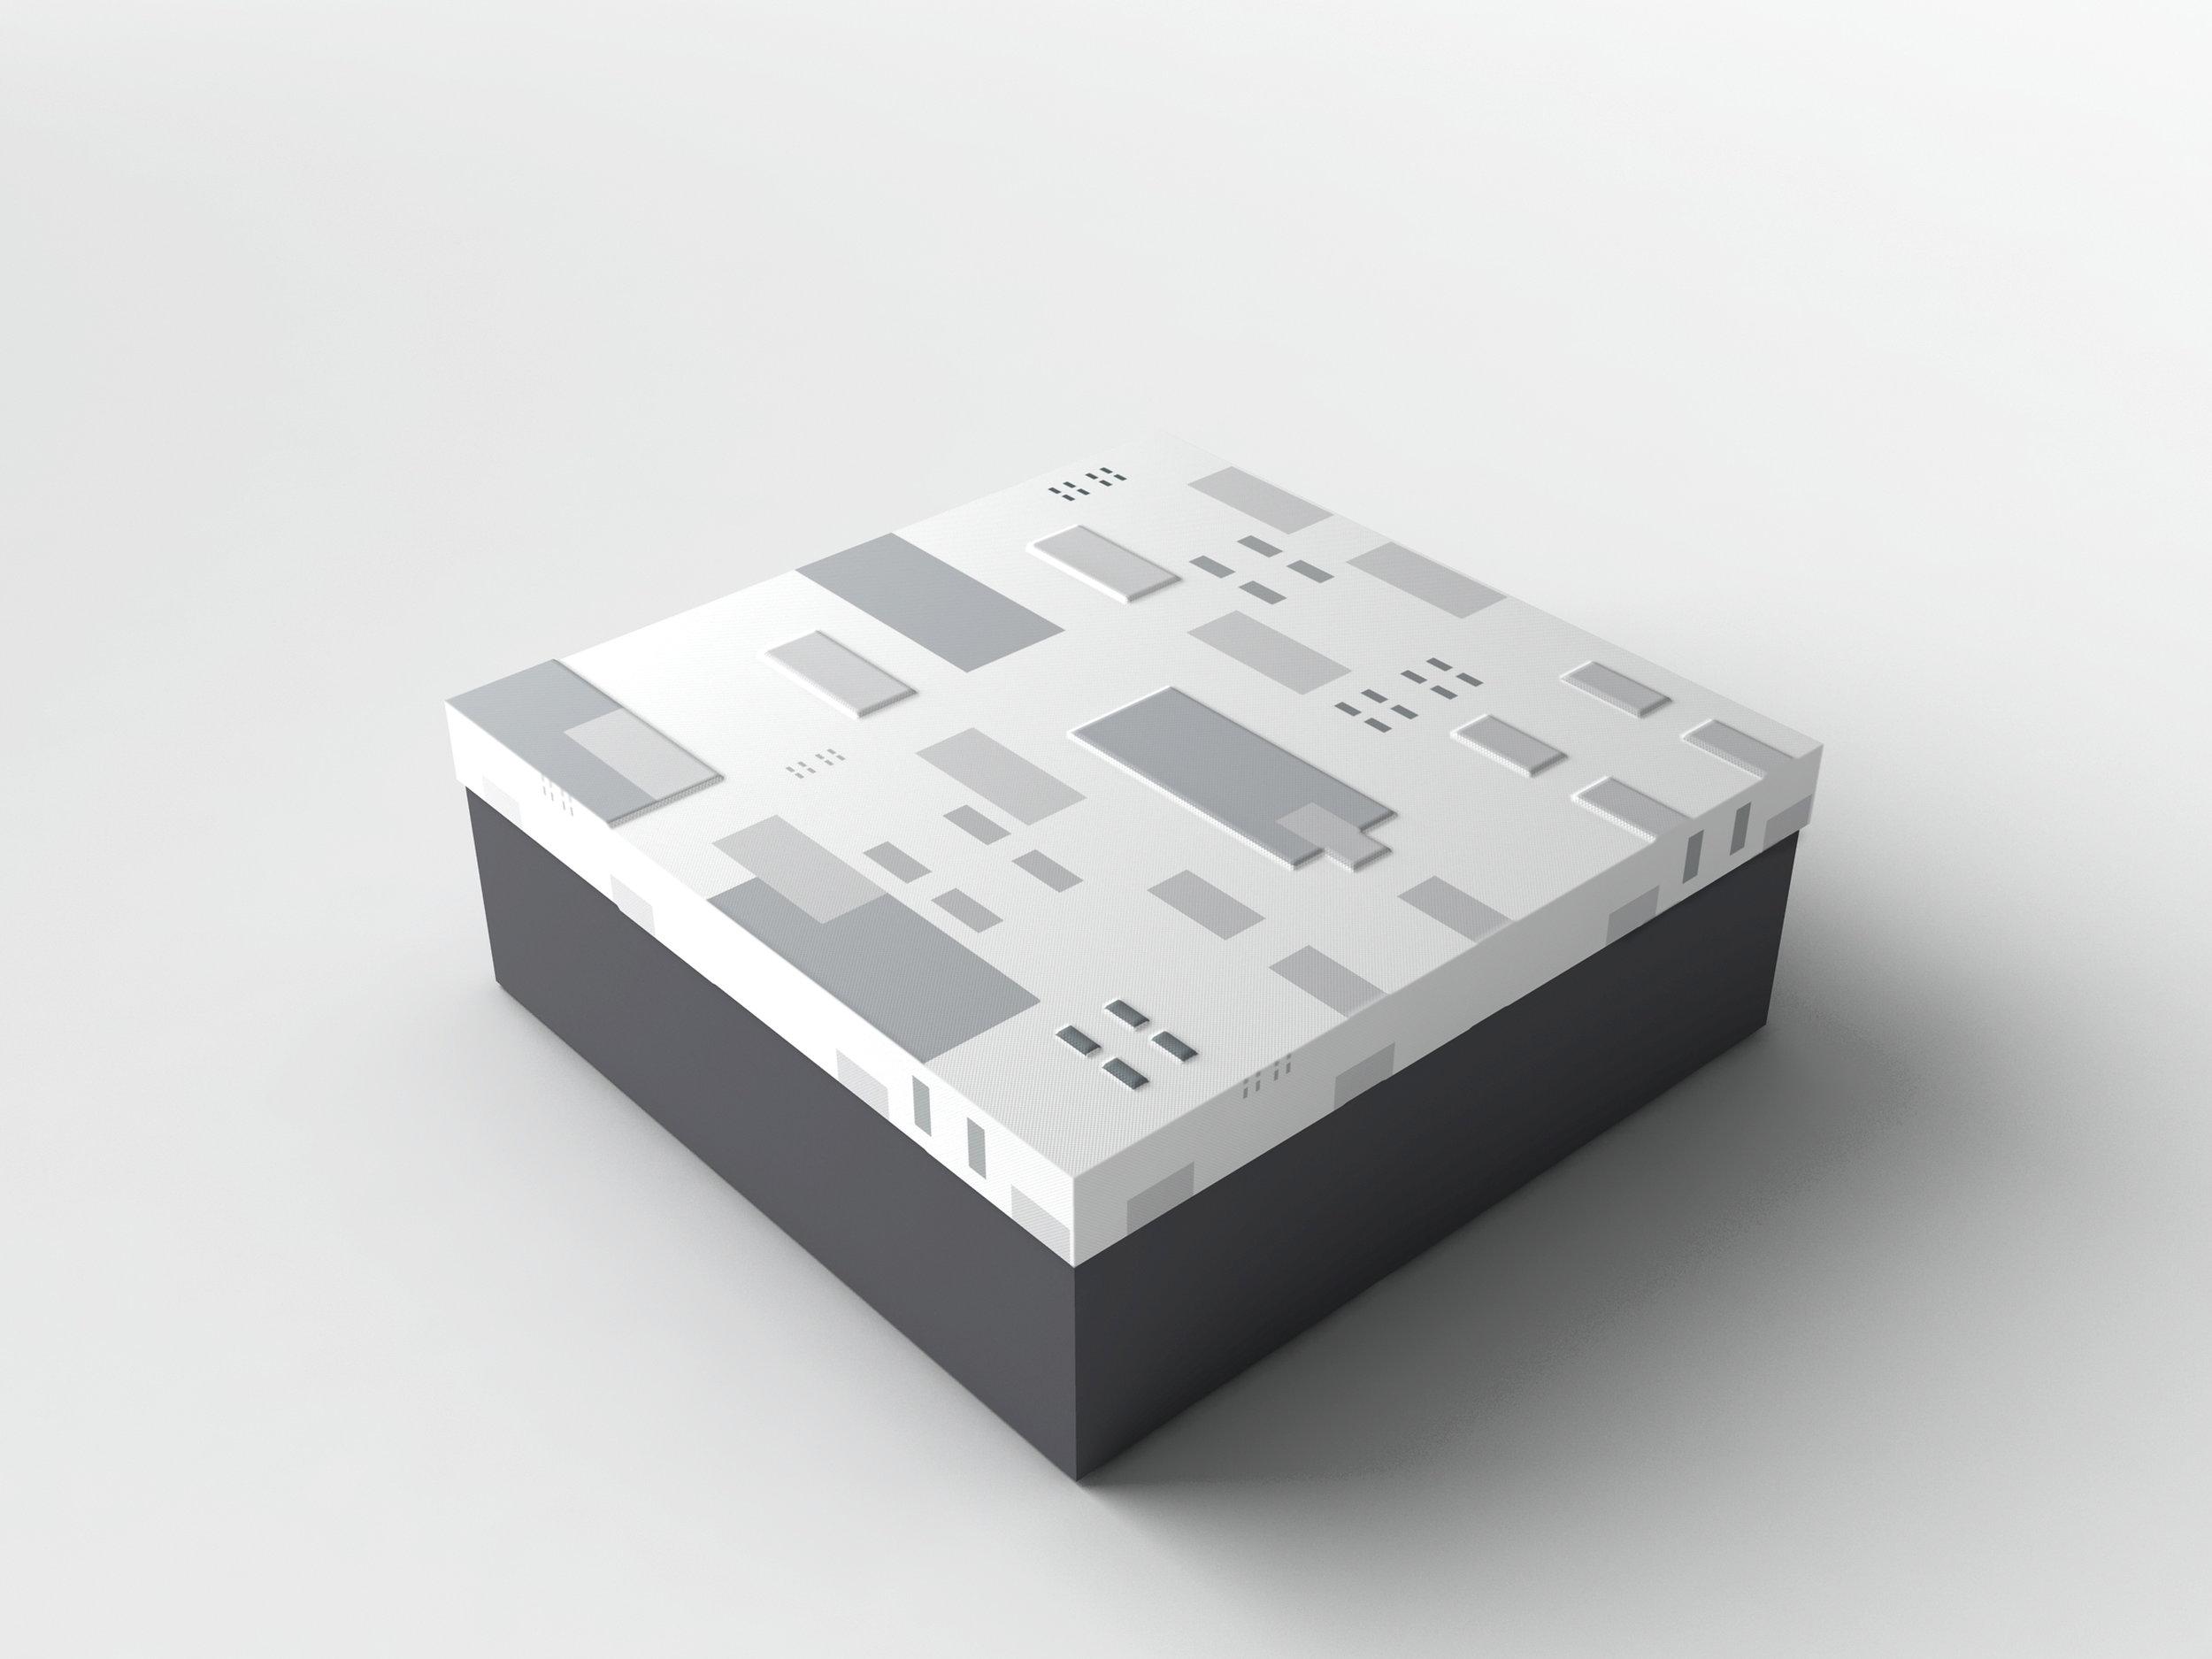 mbbh_box3-11x17.jpg